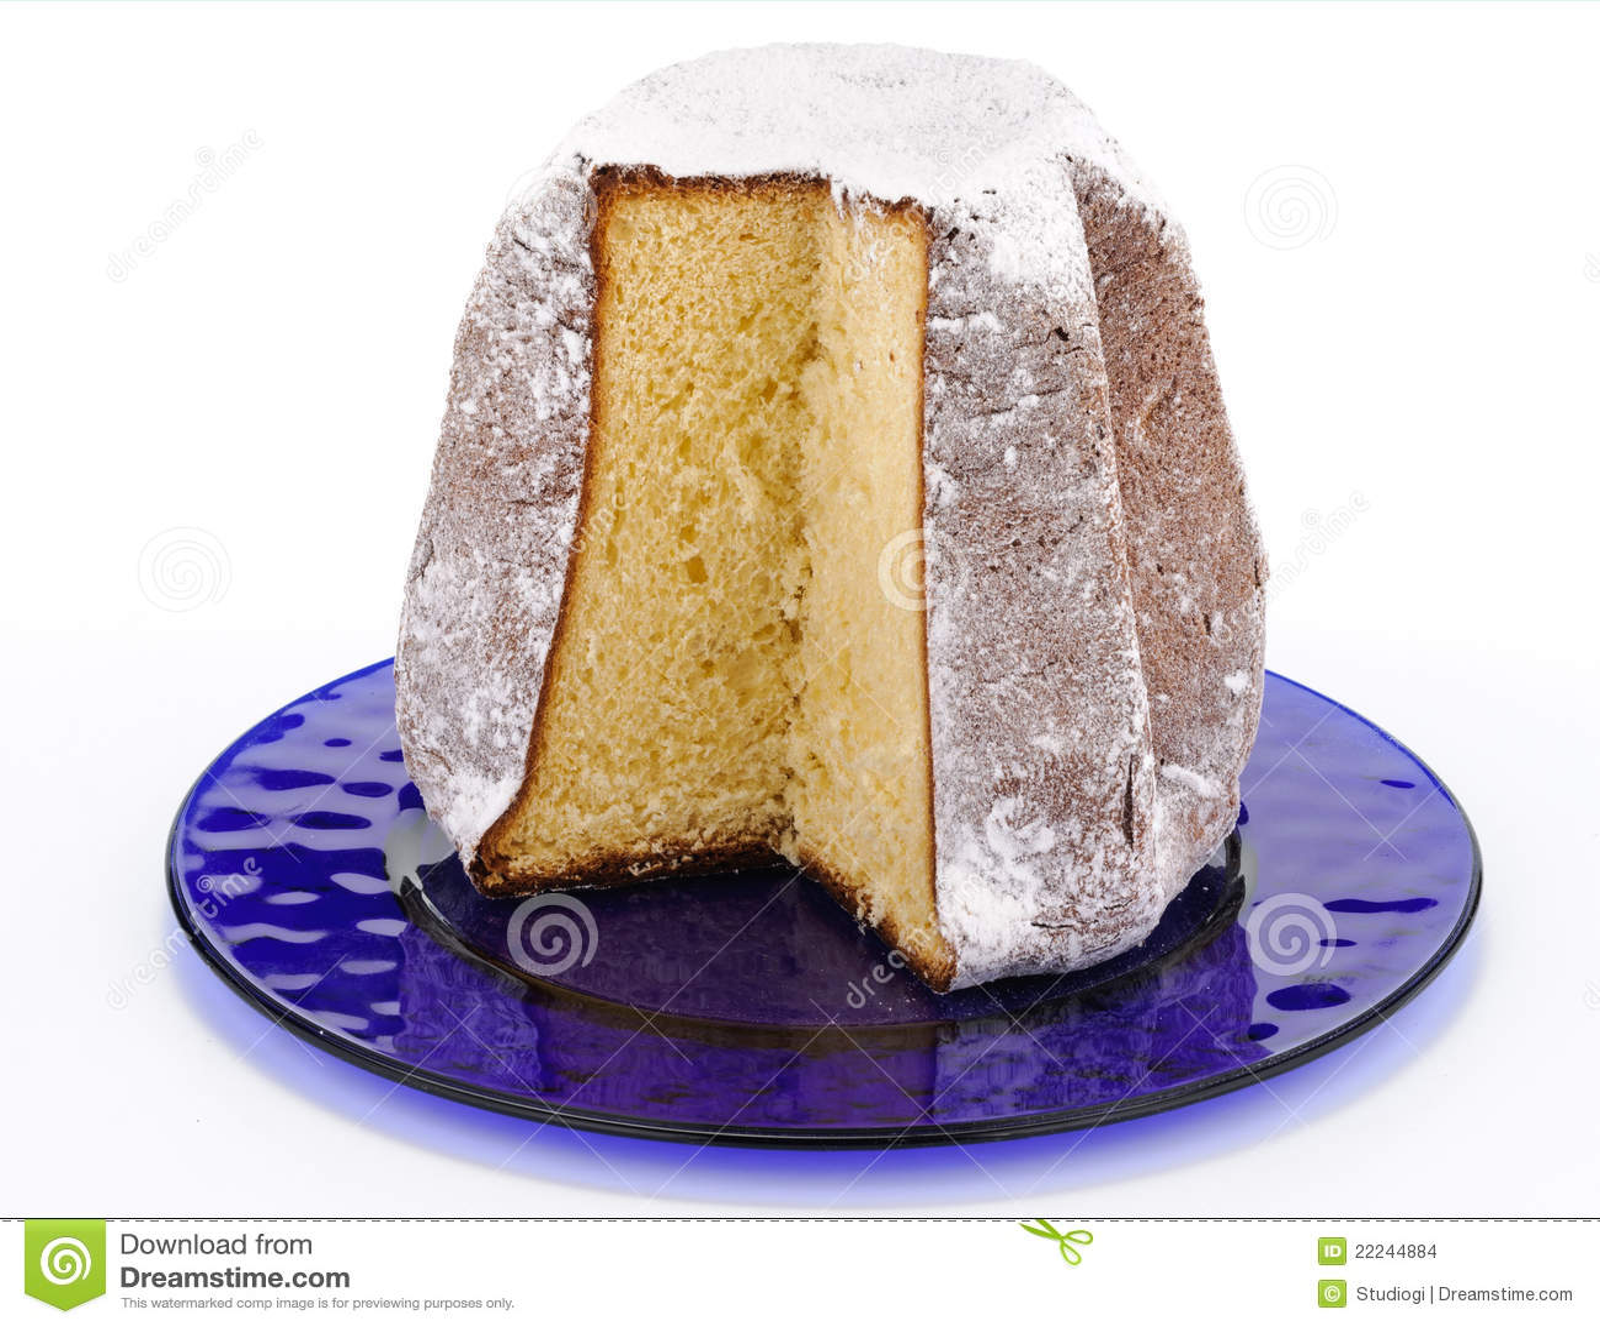 Pandoro , typical italian Christmas cake from Verona made from flour ...